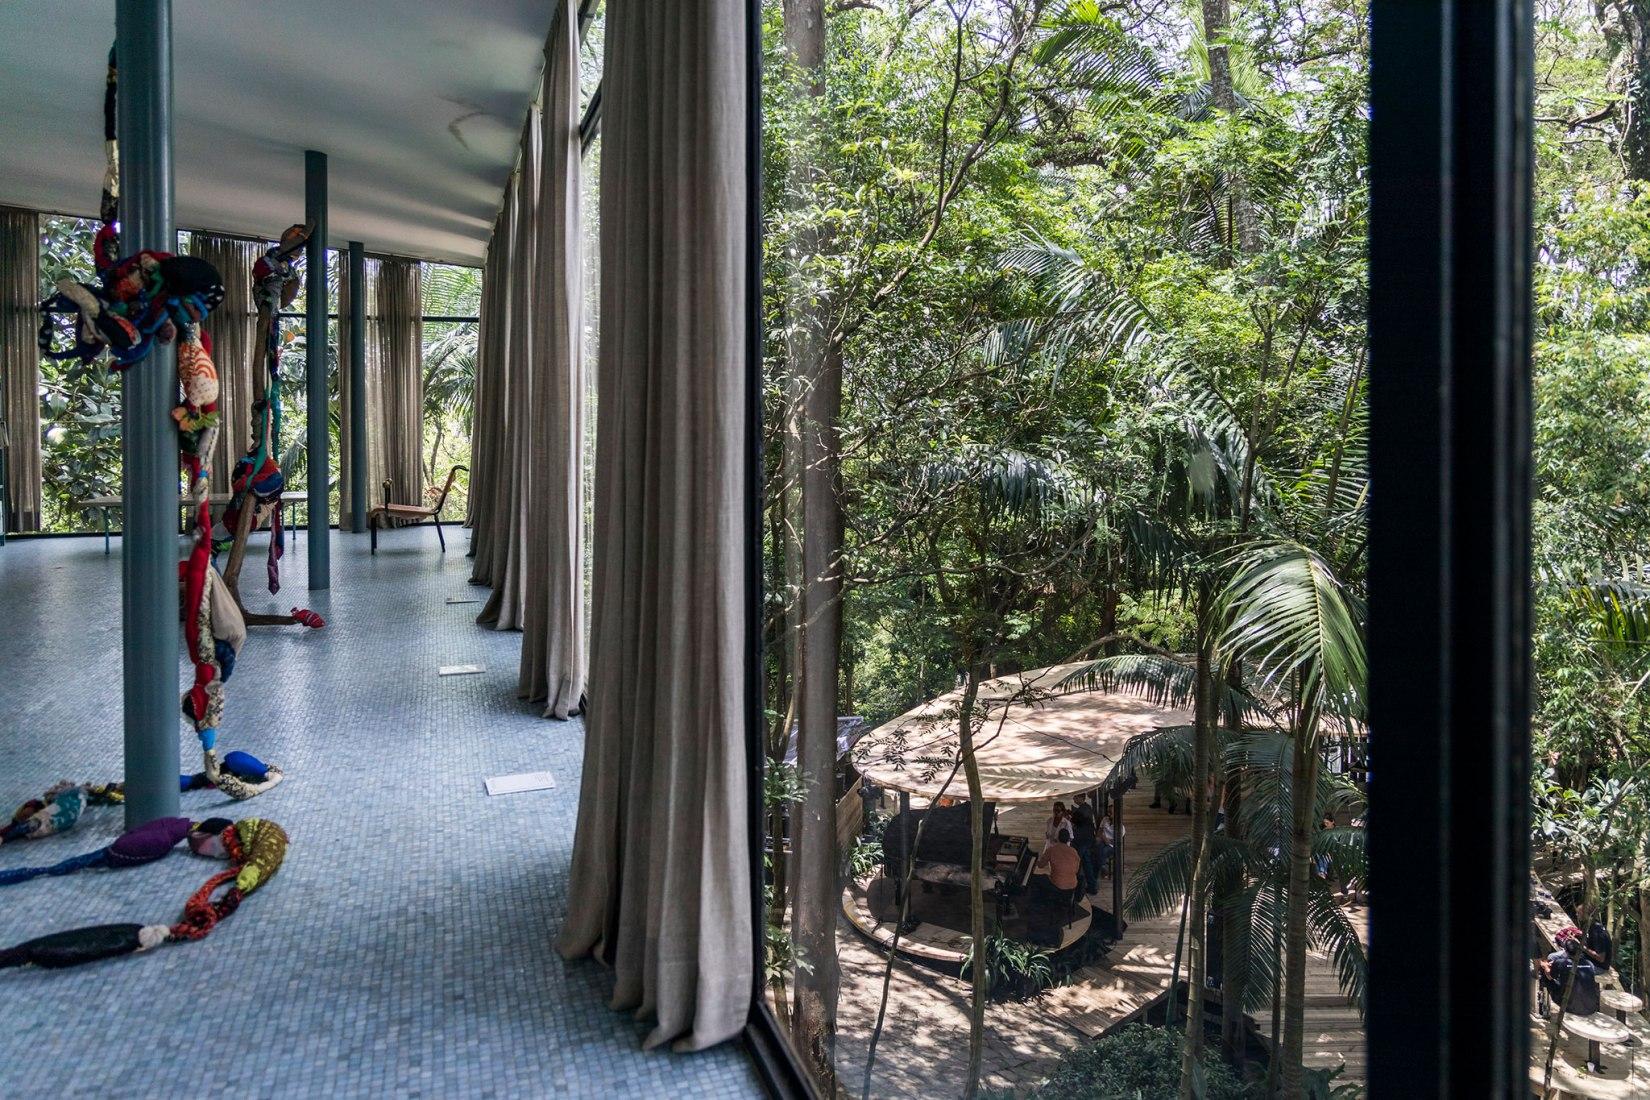 Pavilhão de Verão (Summer Pavilion) at Casa de Vidro by Raddar Architecture. Photograph by Simon Plestenjak